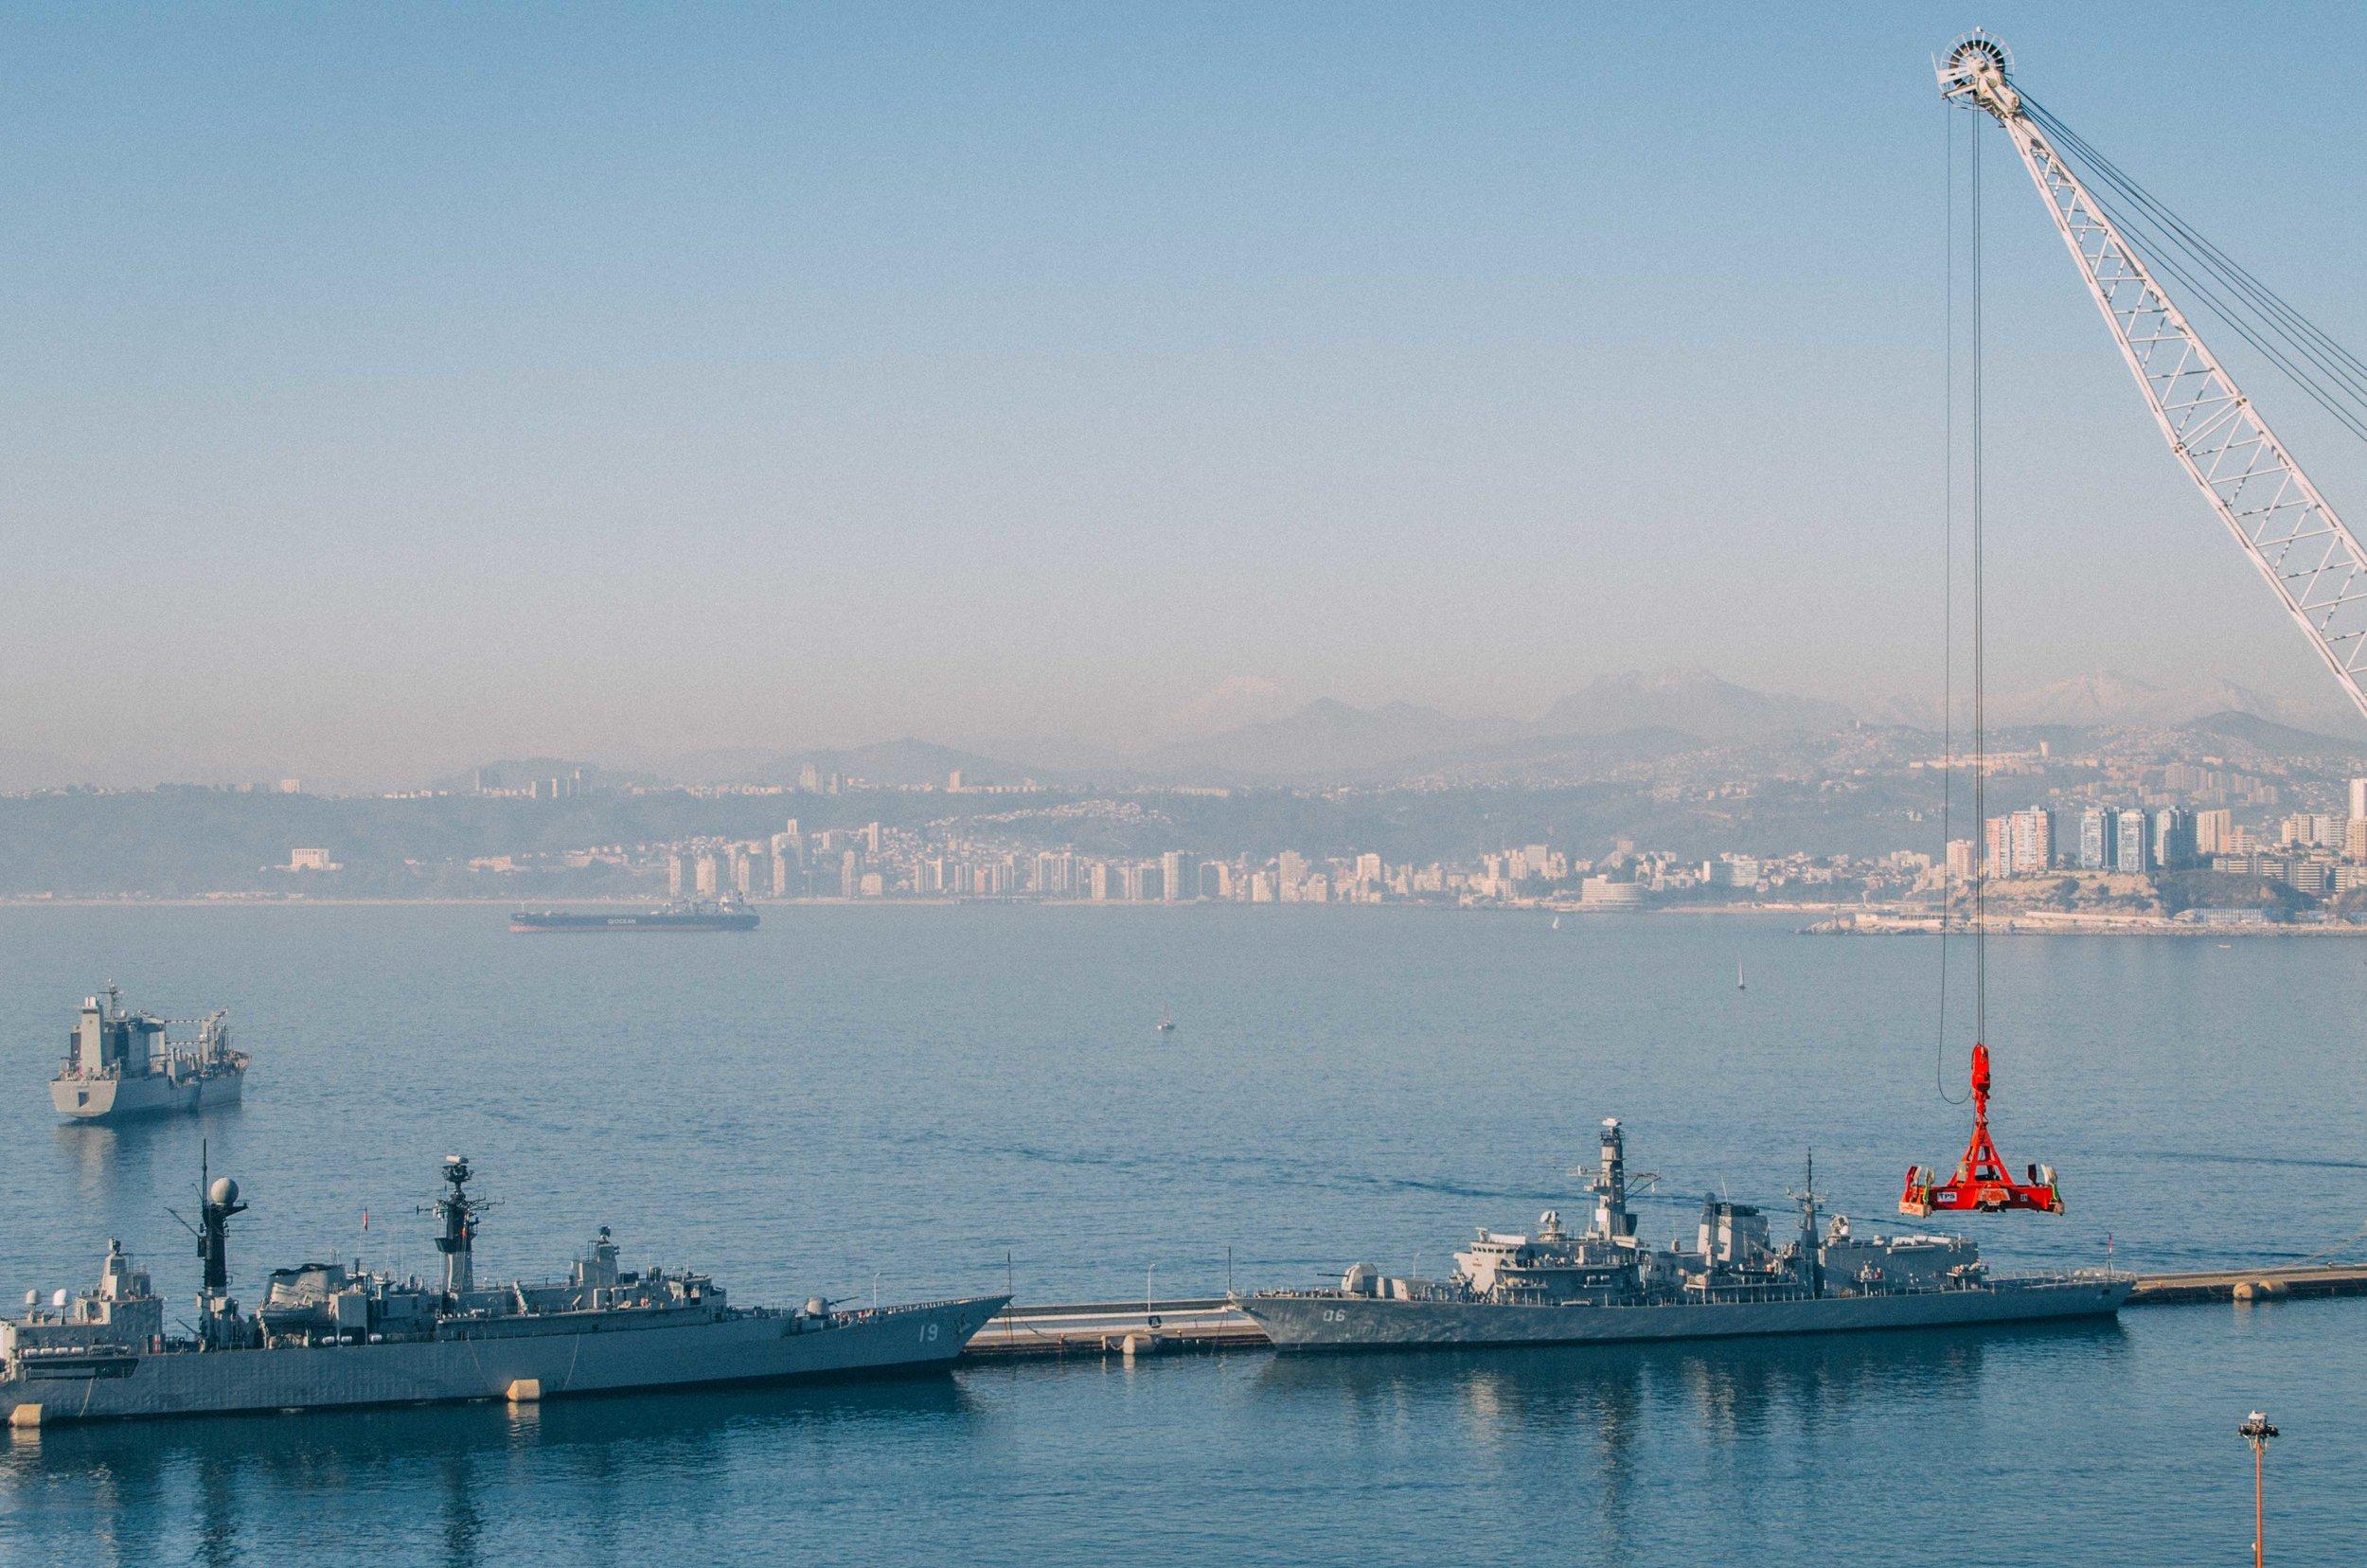 Across the port is either Reñaca or Concón